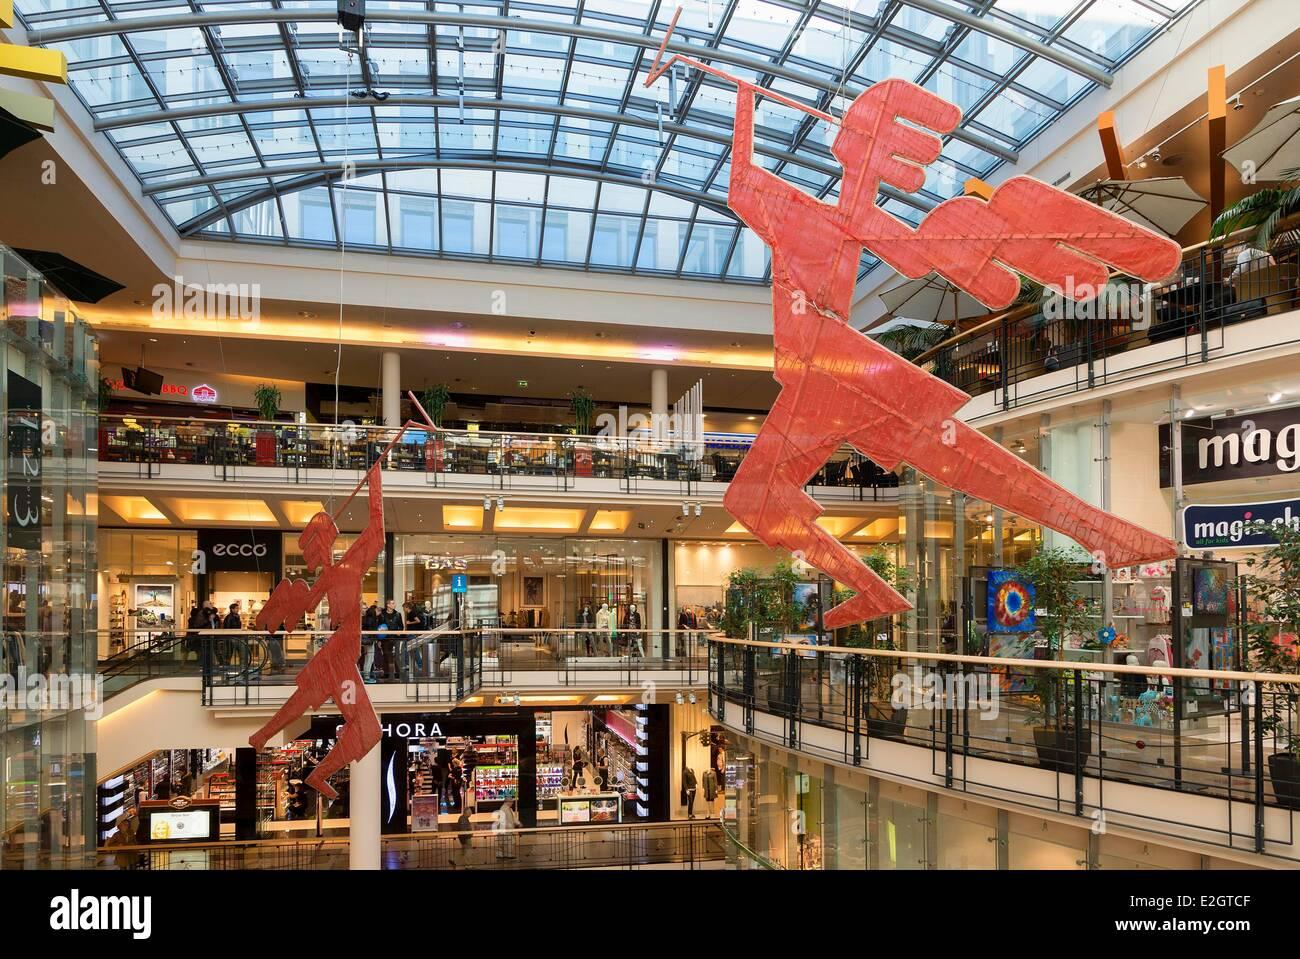 Czech Republic Prague historical centre listed as World Heritage by UNESCO Palladium Shopping Centre Stock Photo